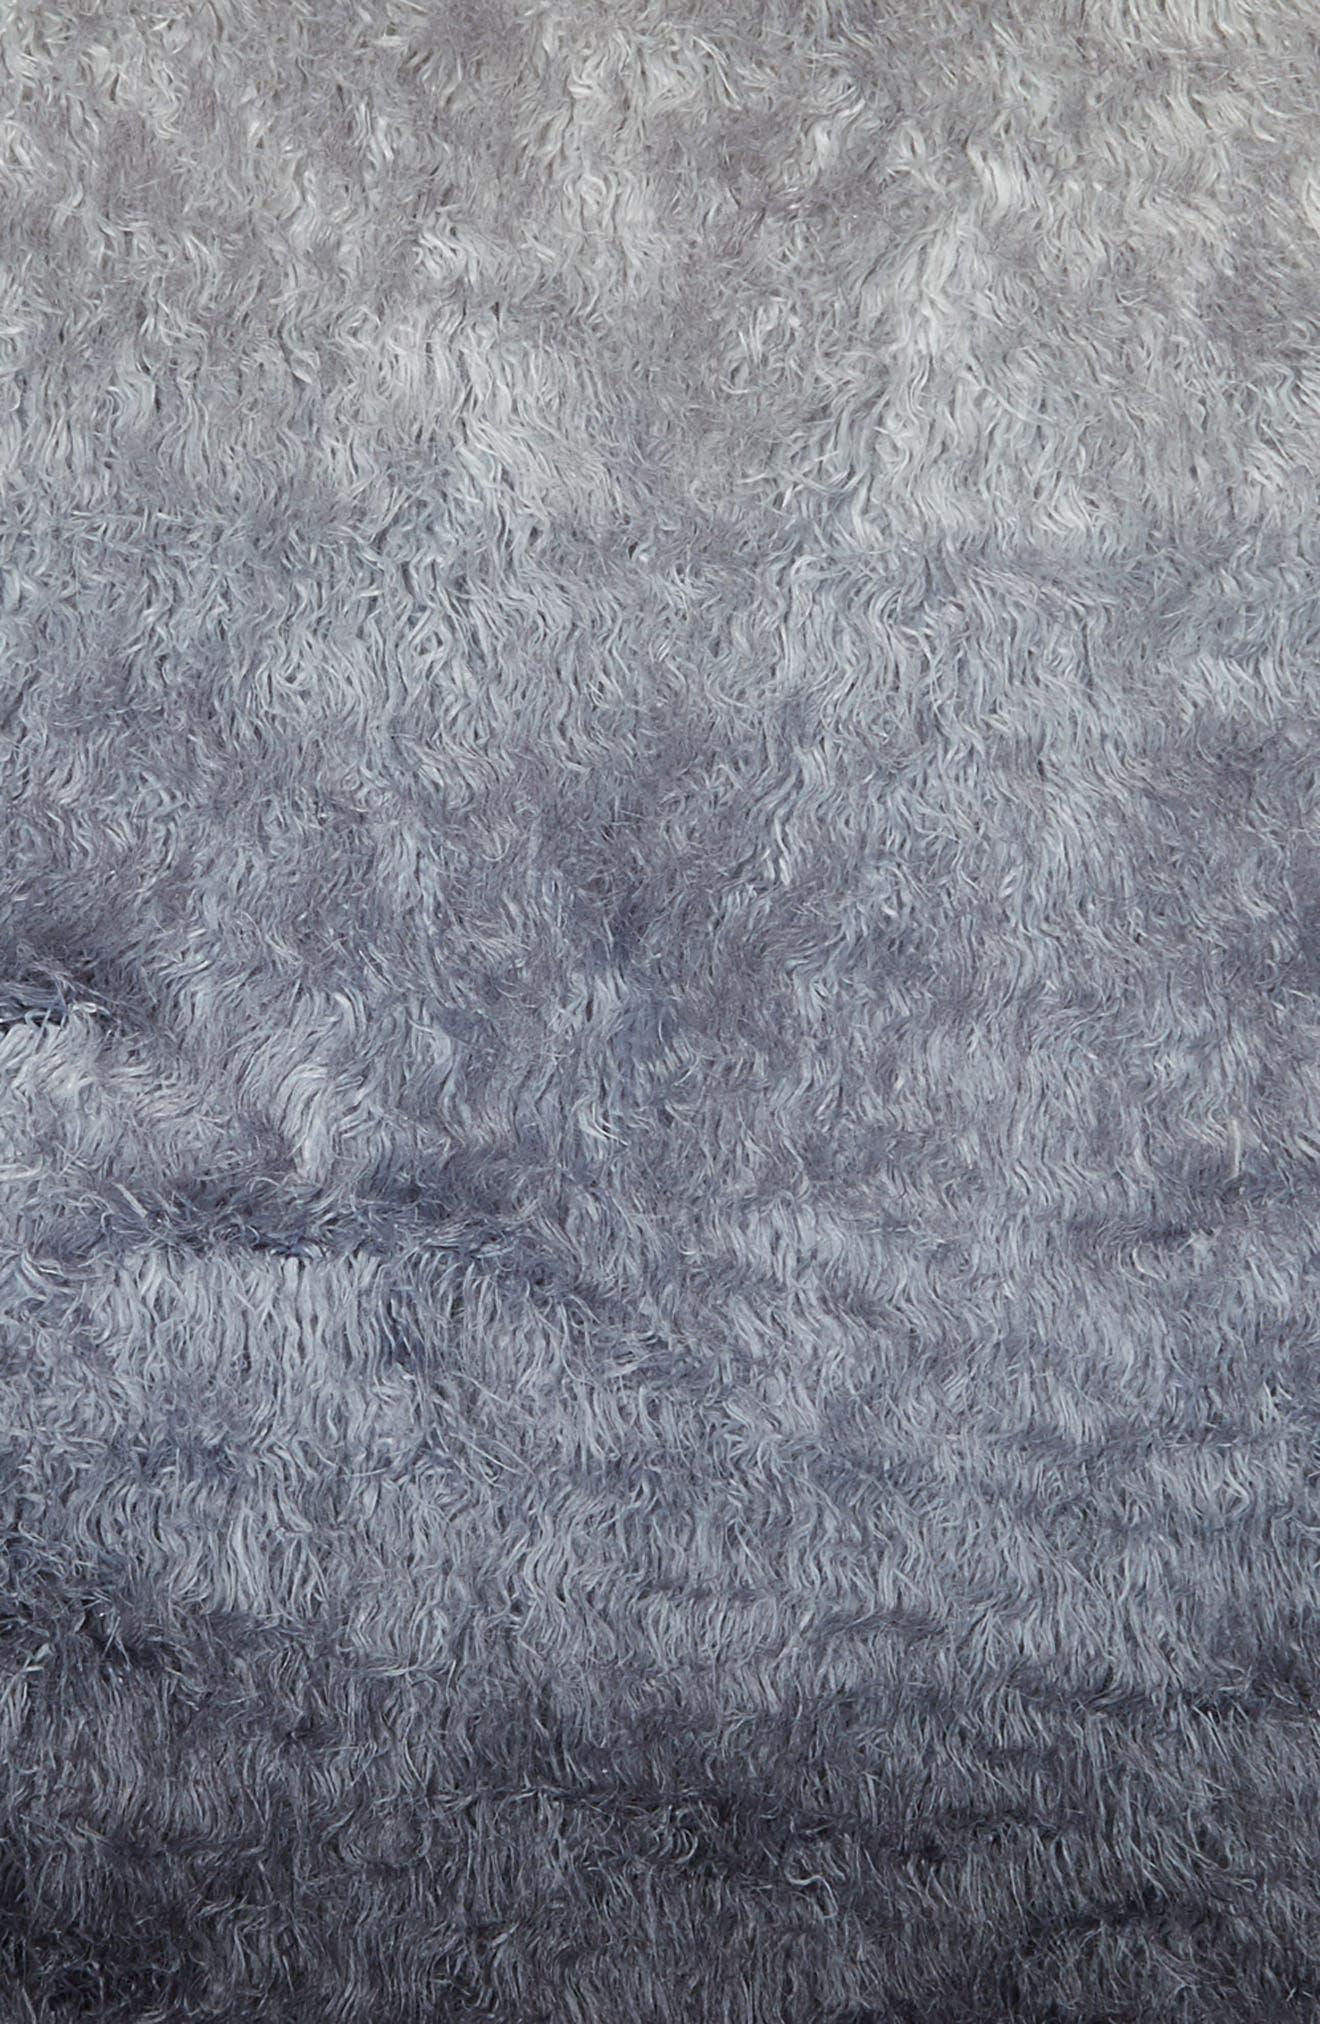 Ombré Faux Fur Rug,                             Alternate thumbnail 2, color,                             Navy Armada